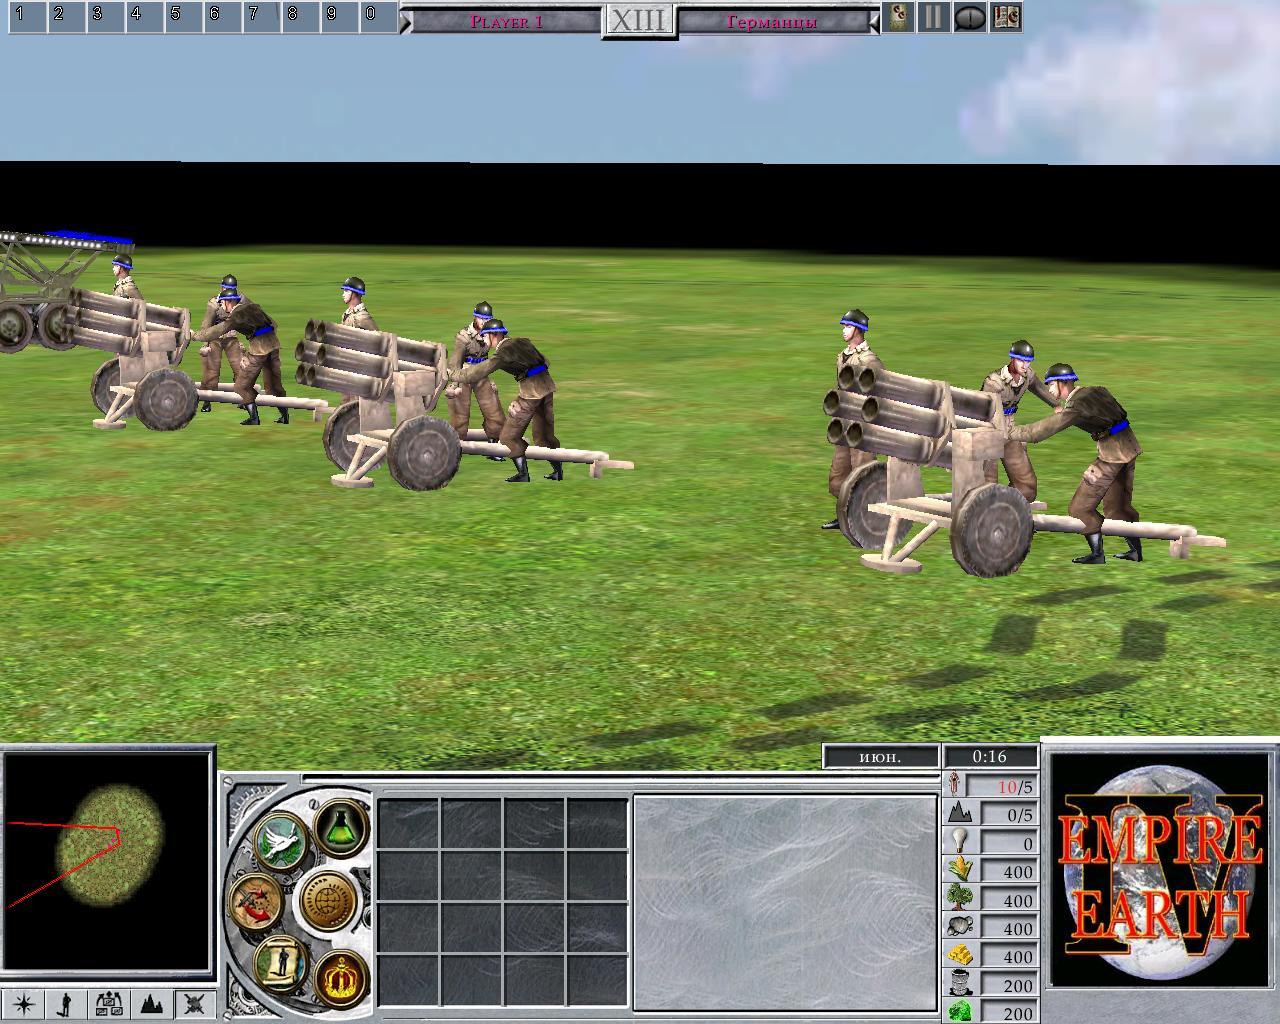 8,0 image - Empire Earth 4 (Mod) v9.0 (English and Russian) for Empire Earth II - Mod DB